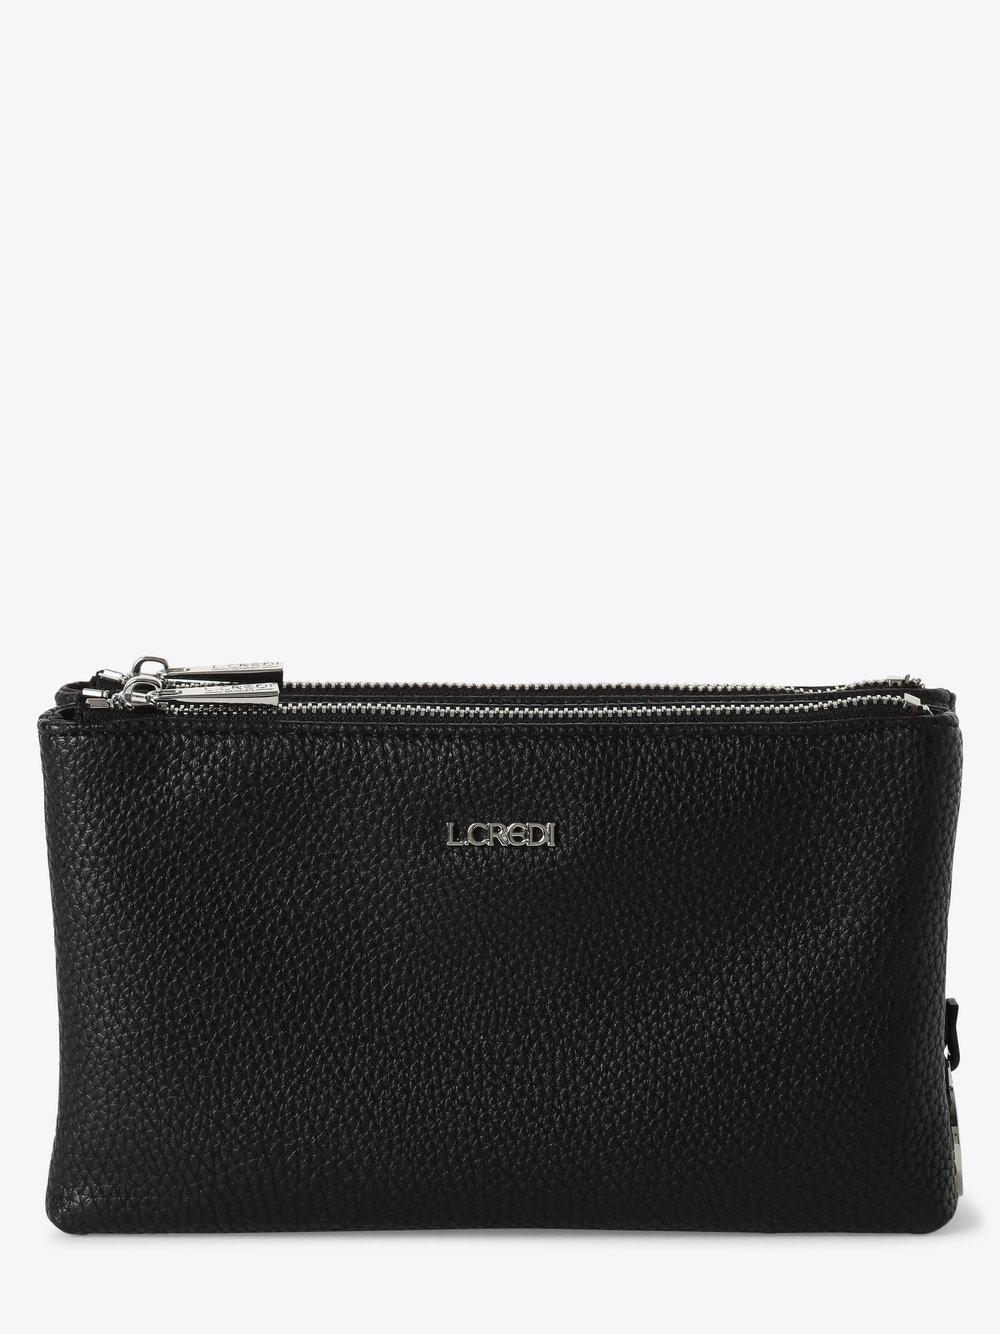 L.Credi - Damska torebka na ramię, czarny